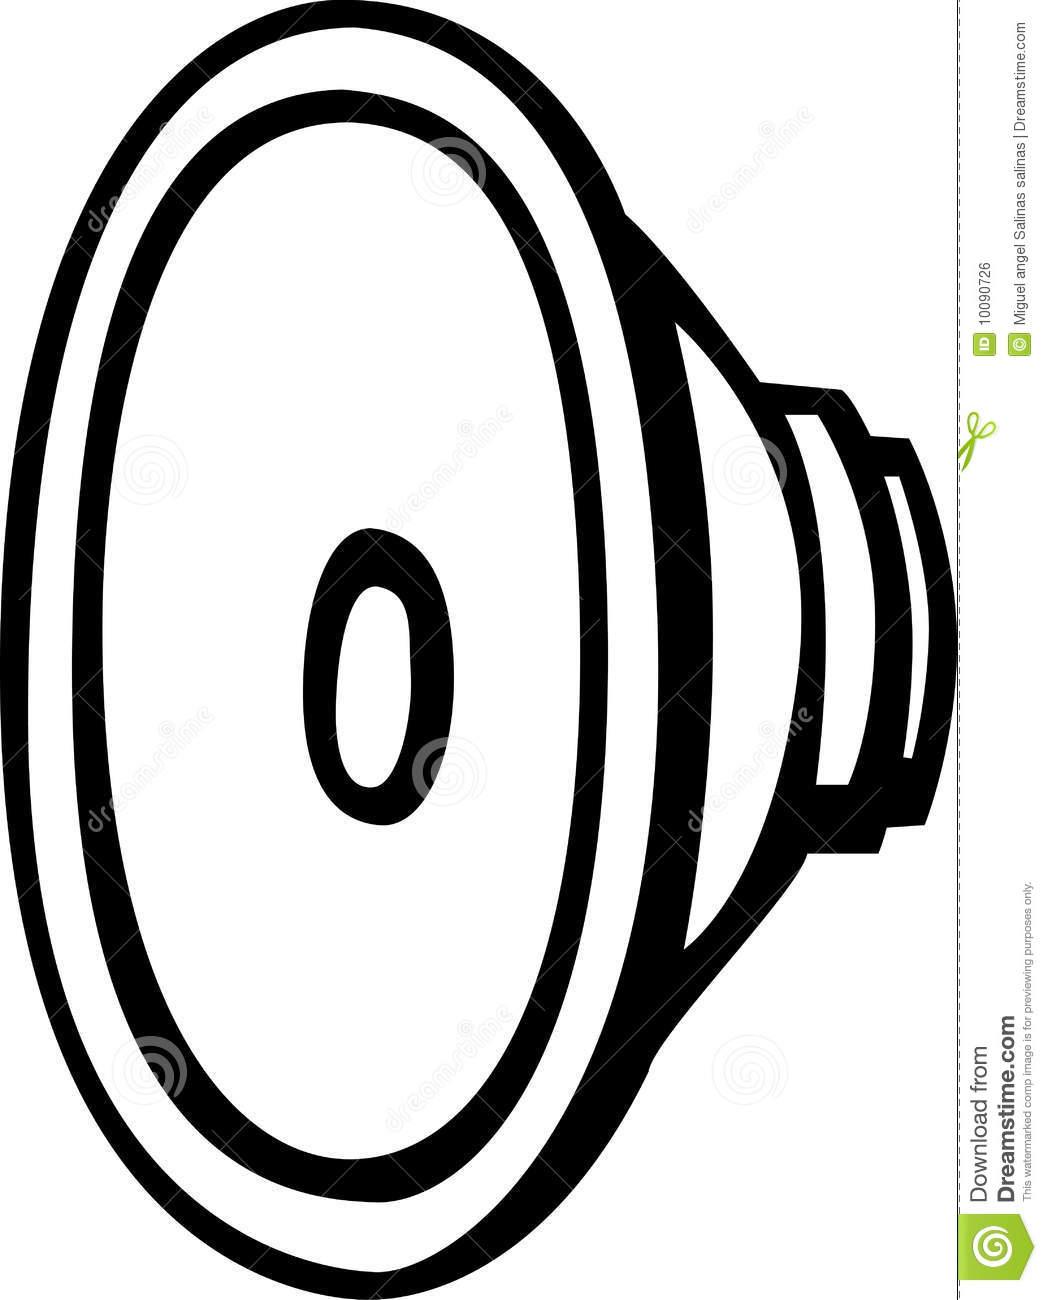 Speaker Driver Vector Illustration Royalty Free Stock Image.